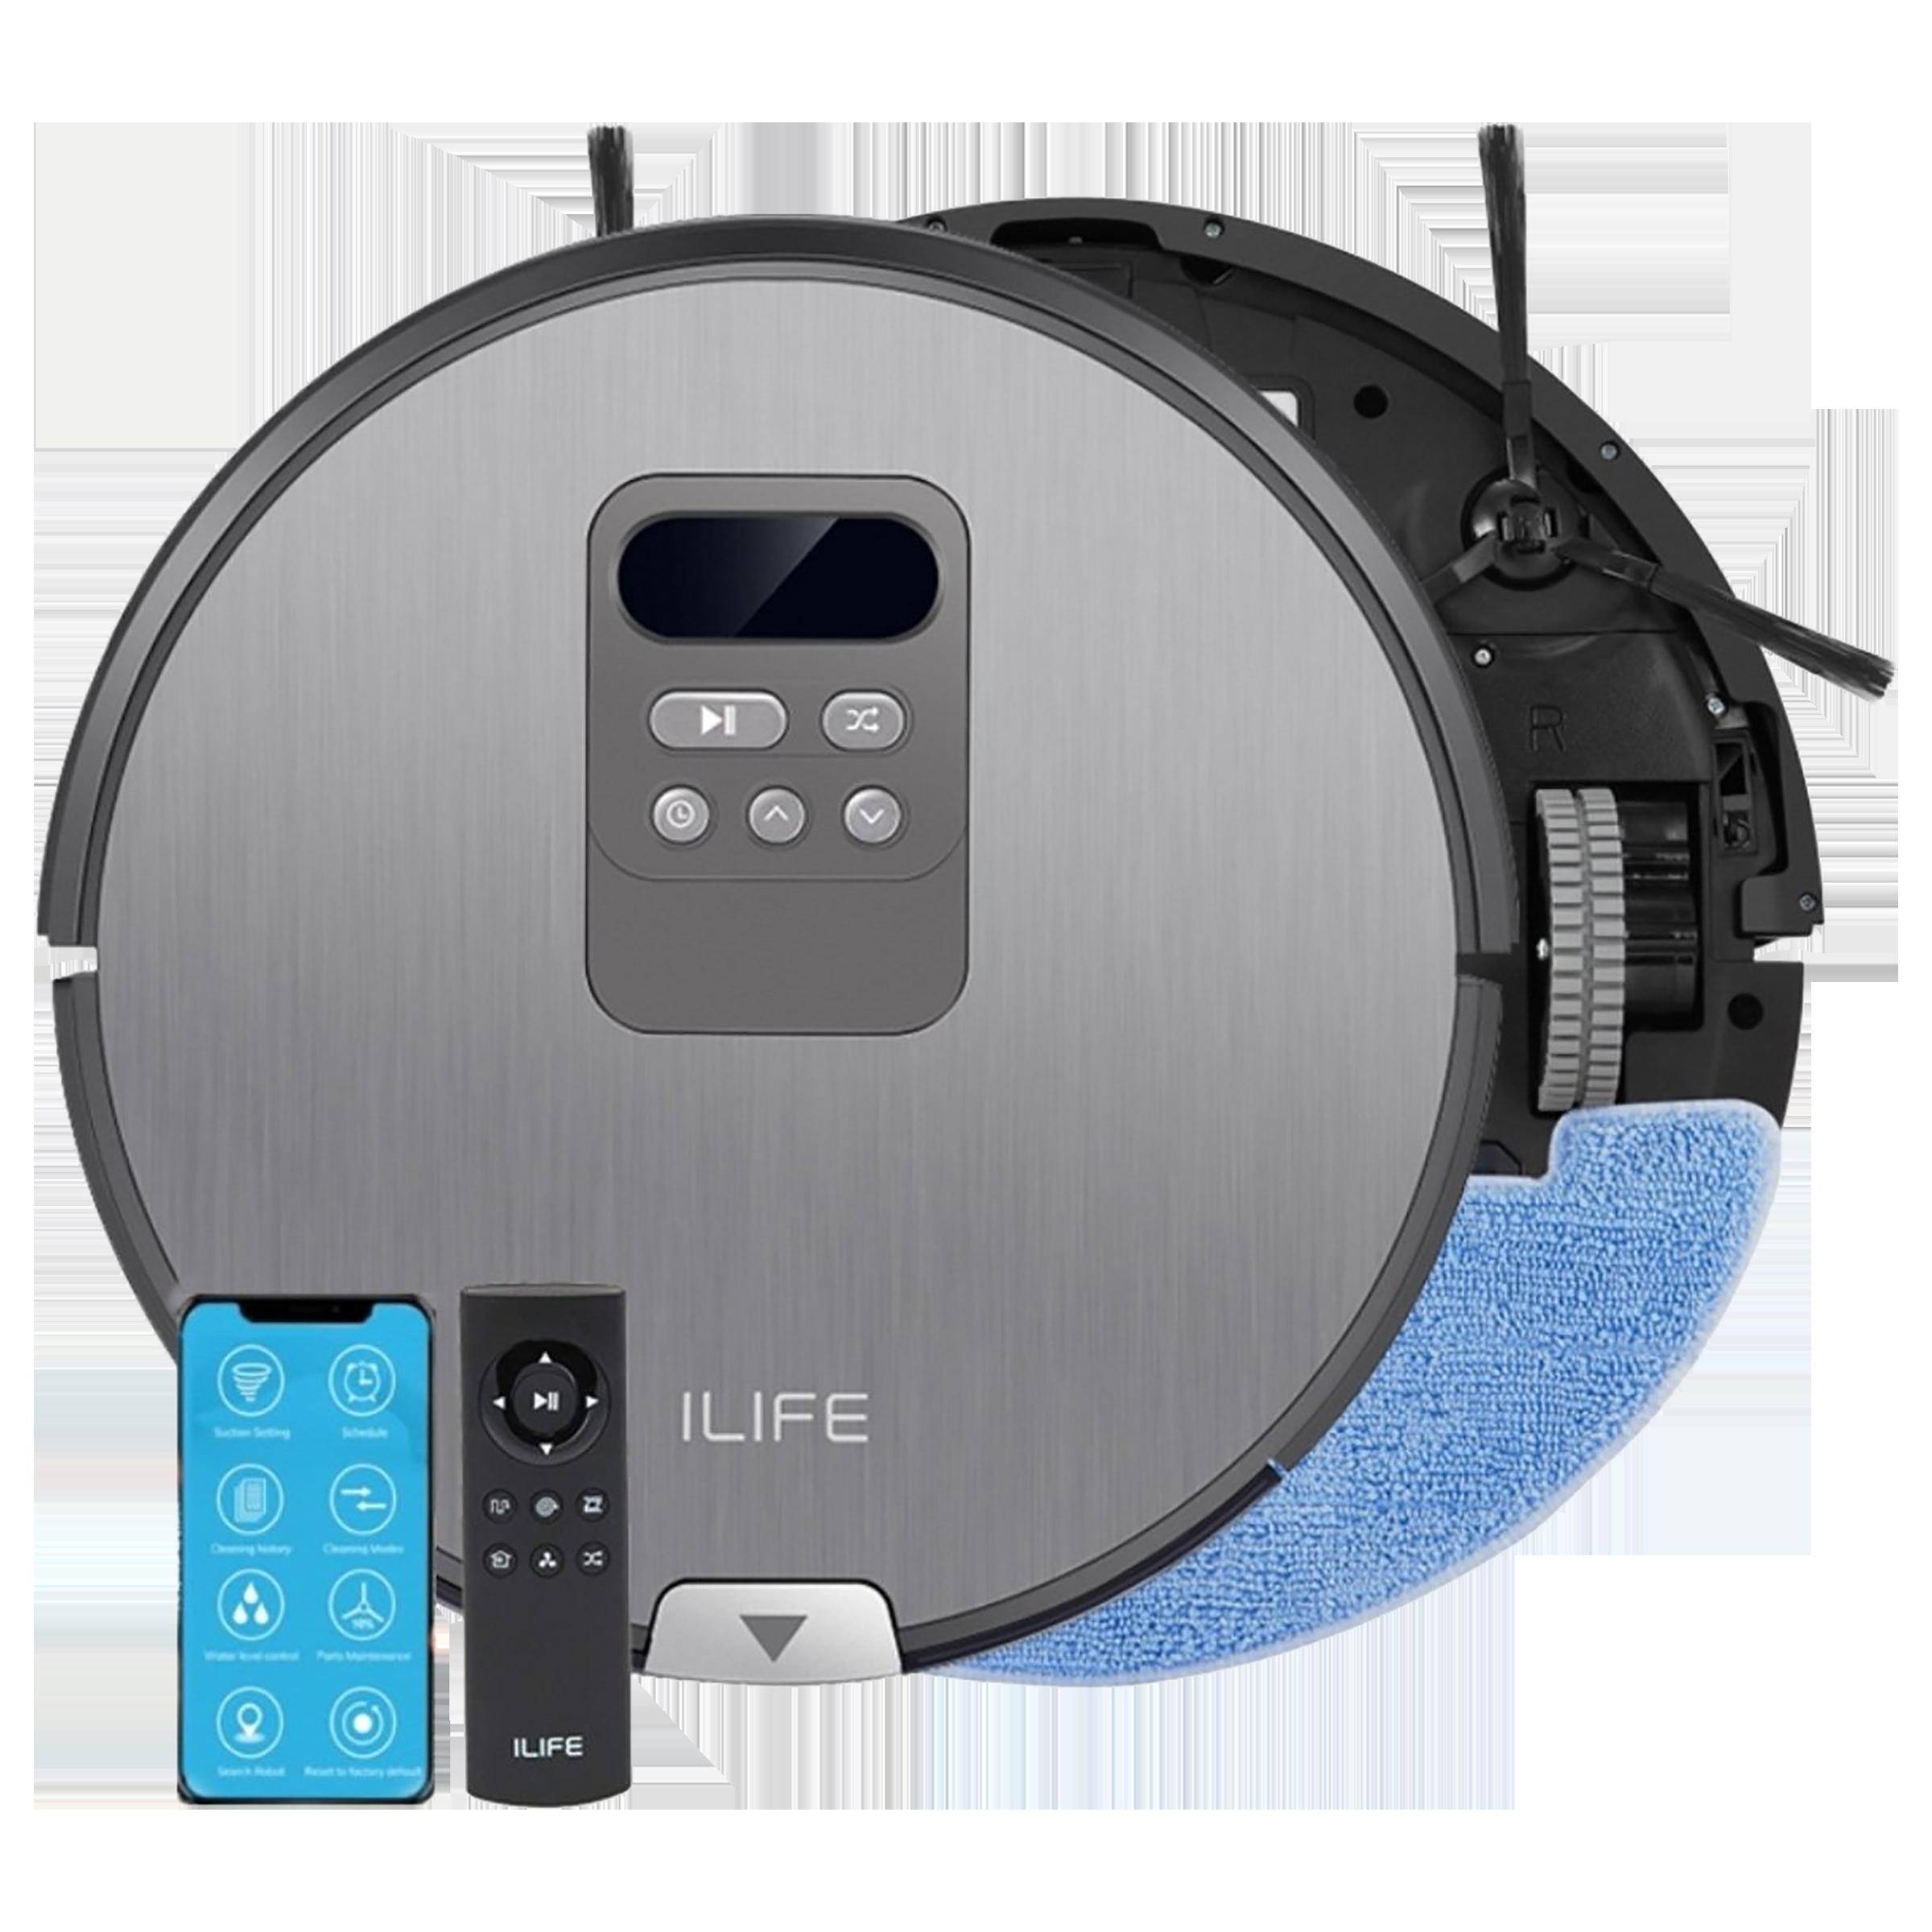 ILIFE 22 Watts Robotic Vacuum Cleaner (V80 Pro, Metal Grey)_1